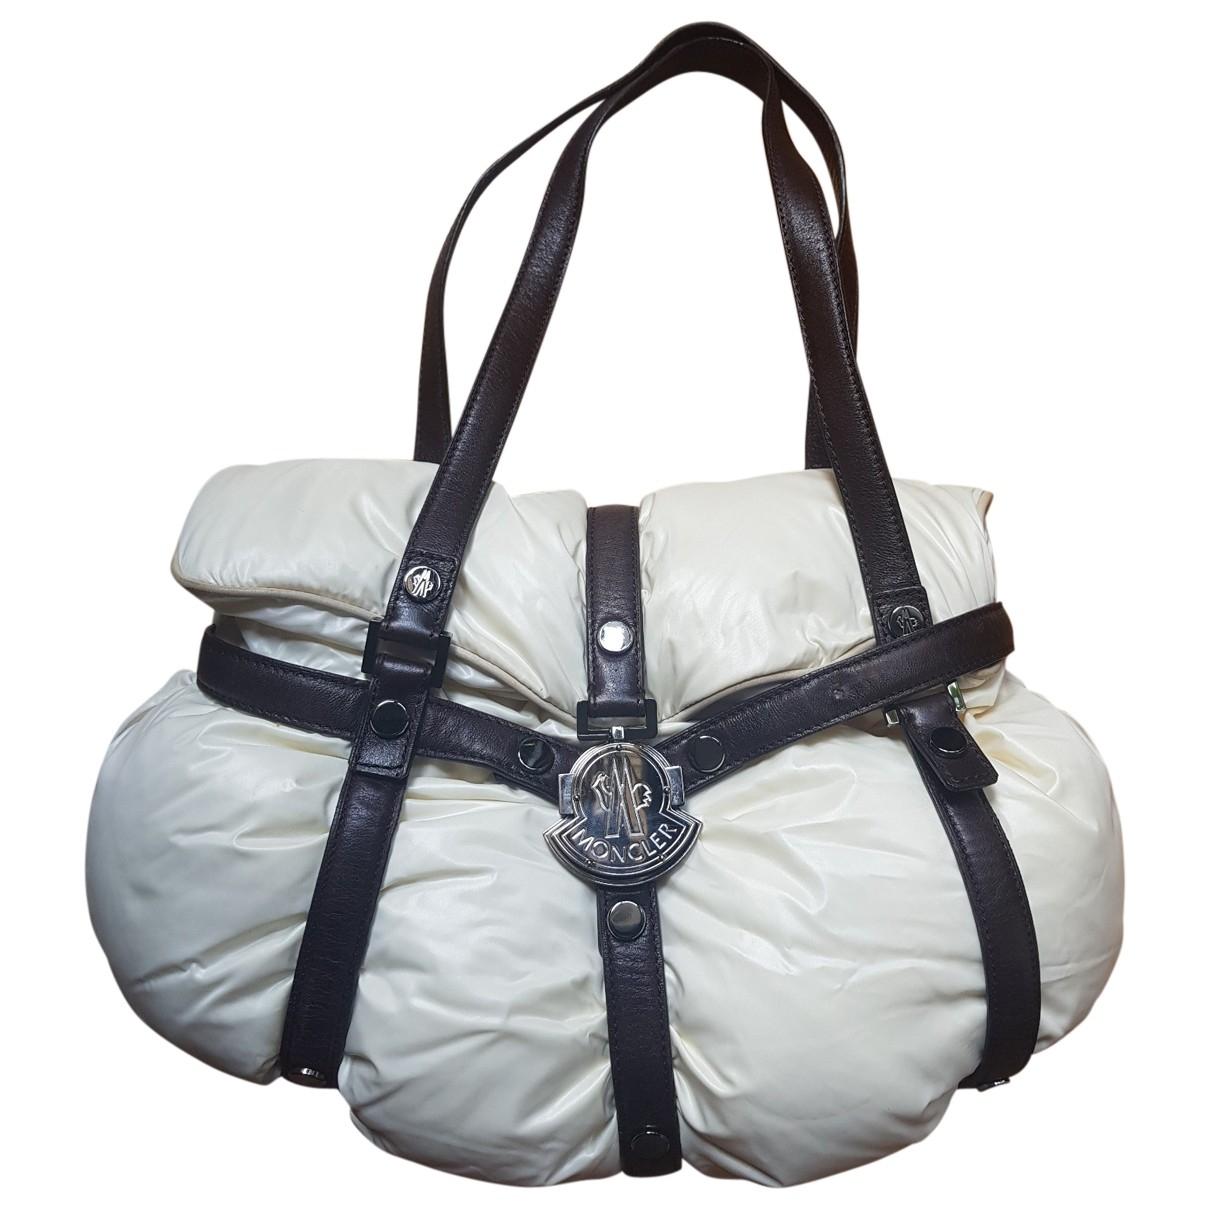 Moncler \N Beige handbag for Women \N